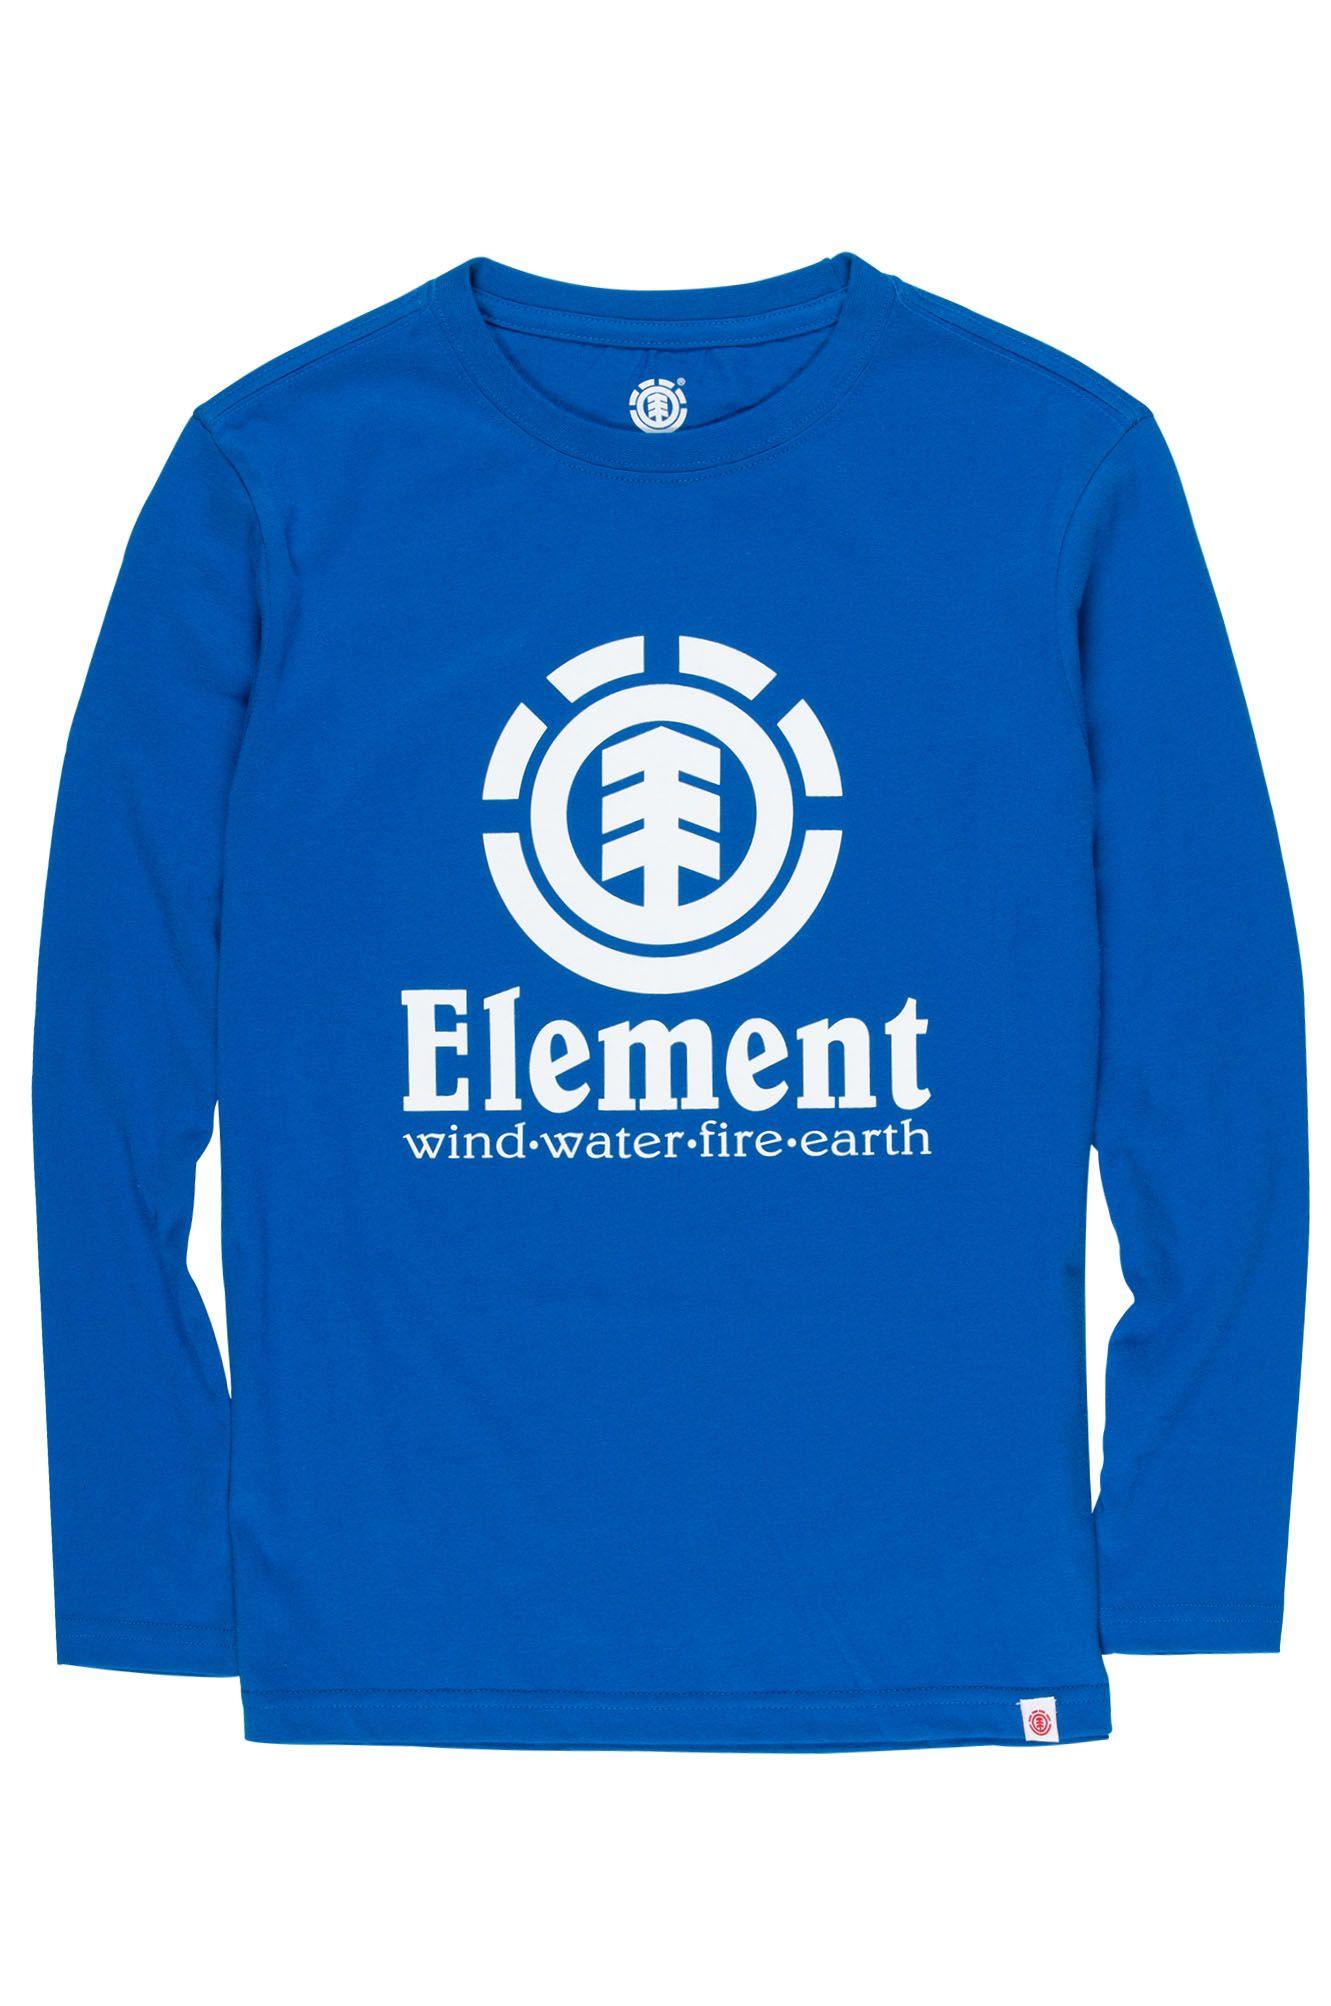 L-Sleeve Element VERTICAL Nautical Blue